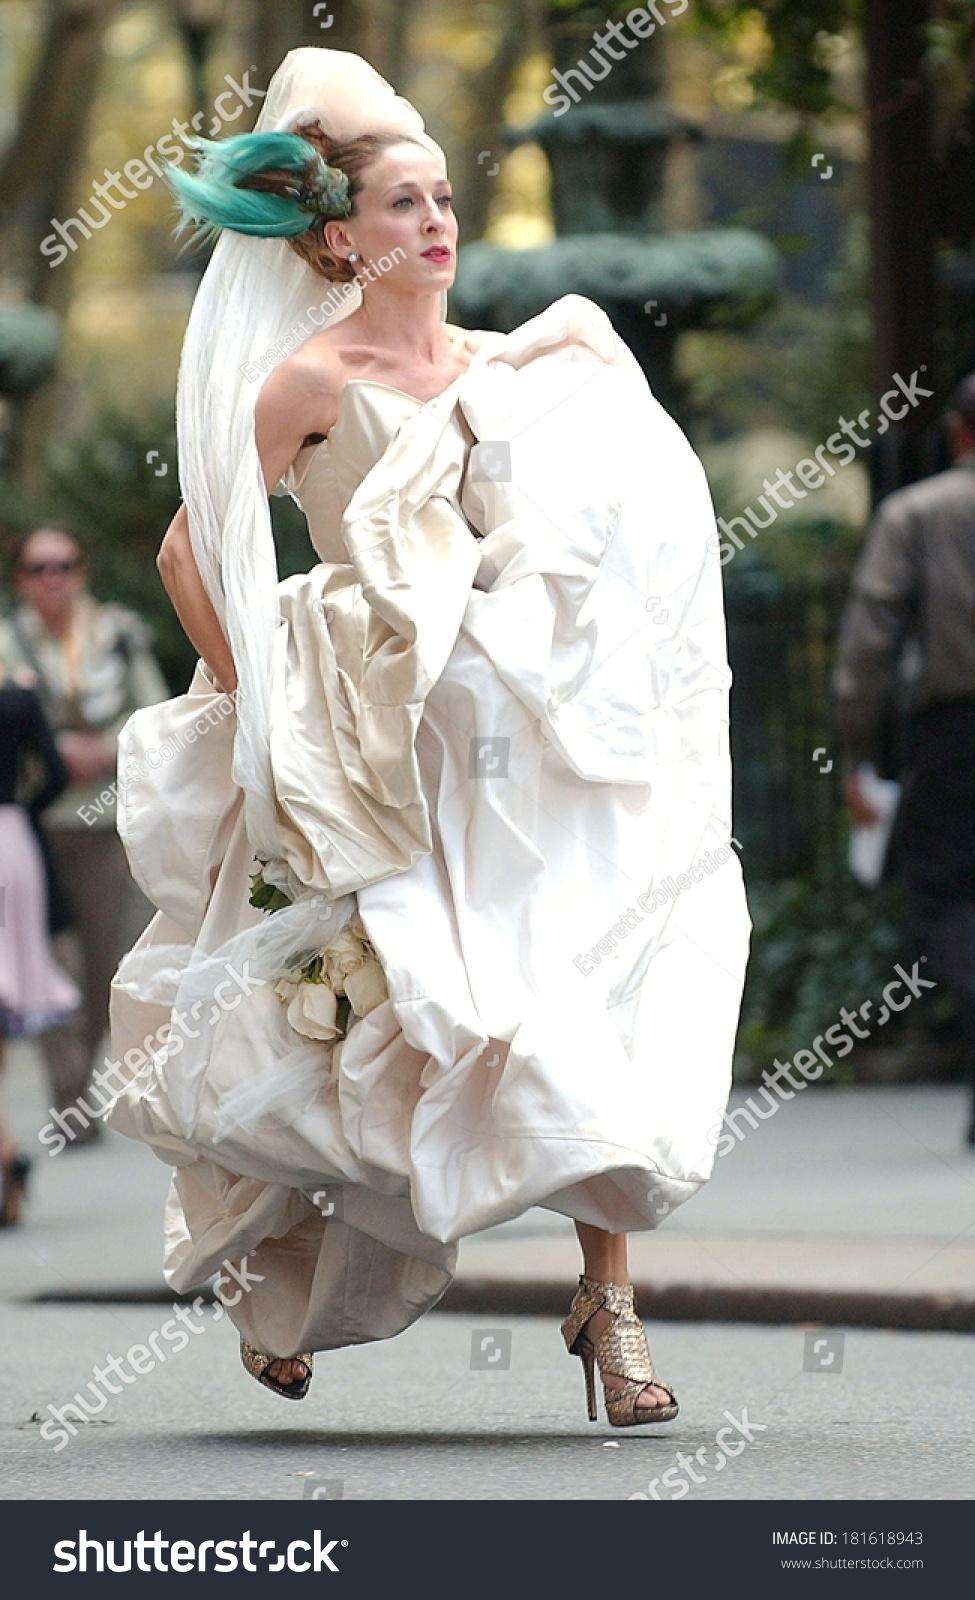 Sarah Jessica Parker wears Vivienne Westwood to NYC gala